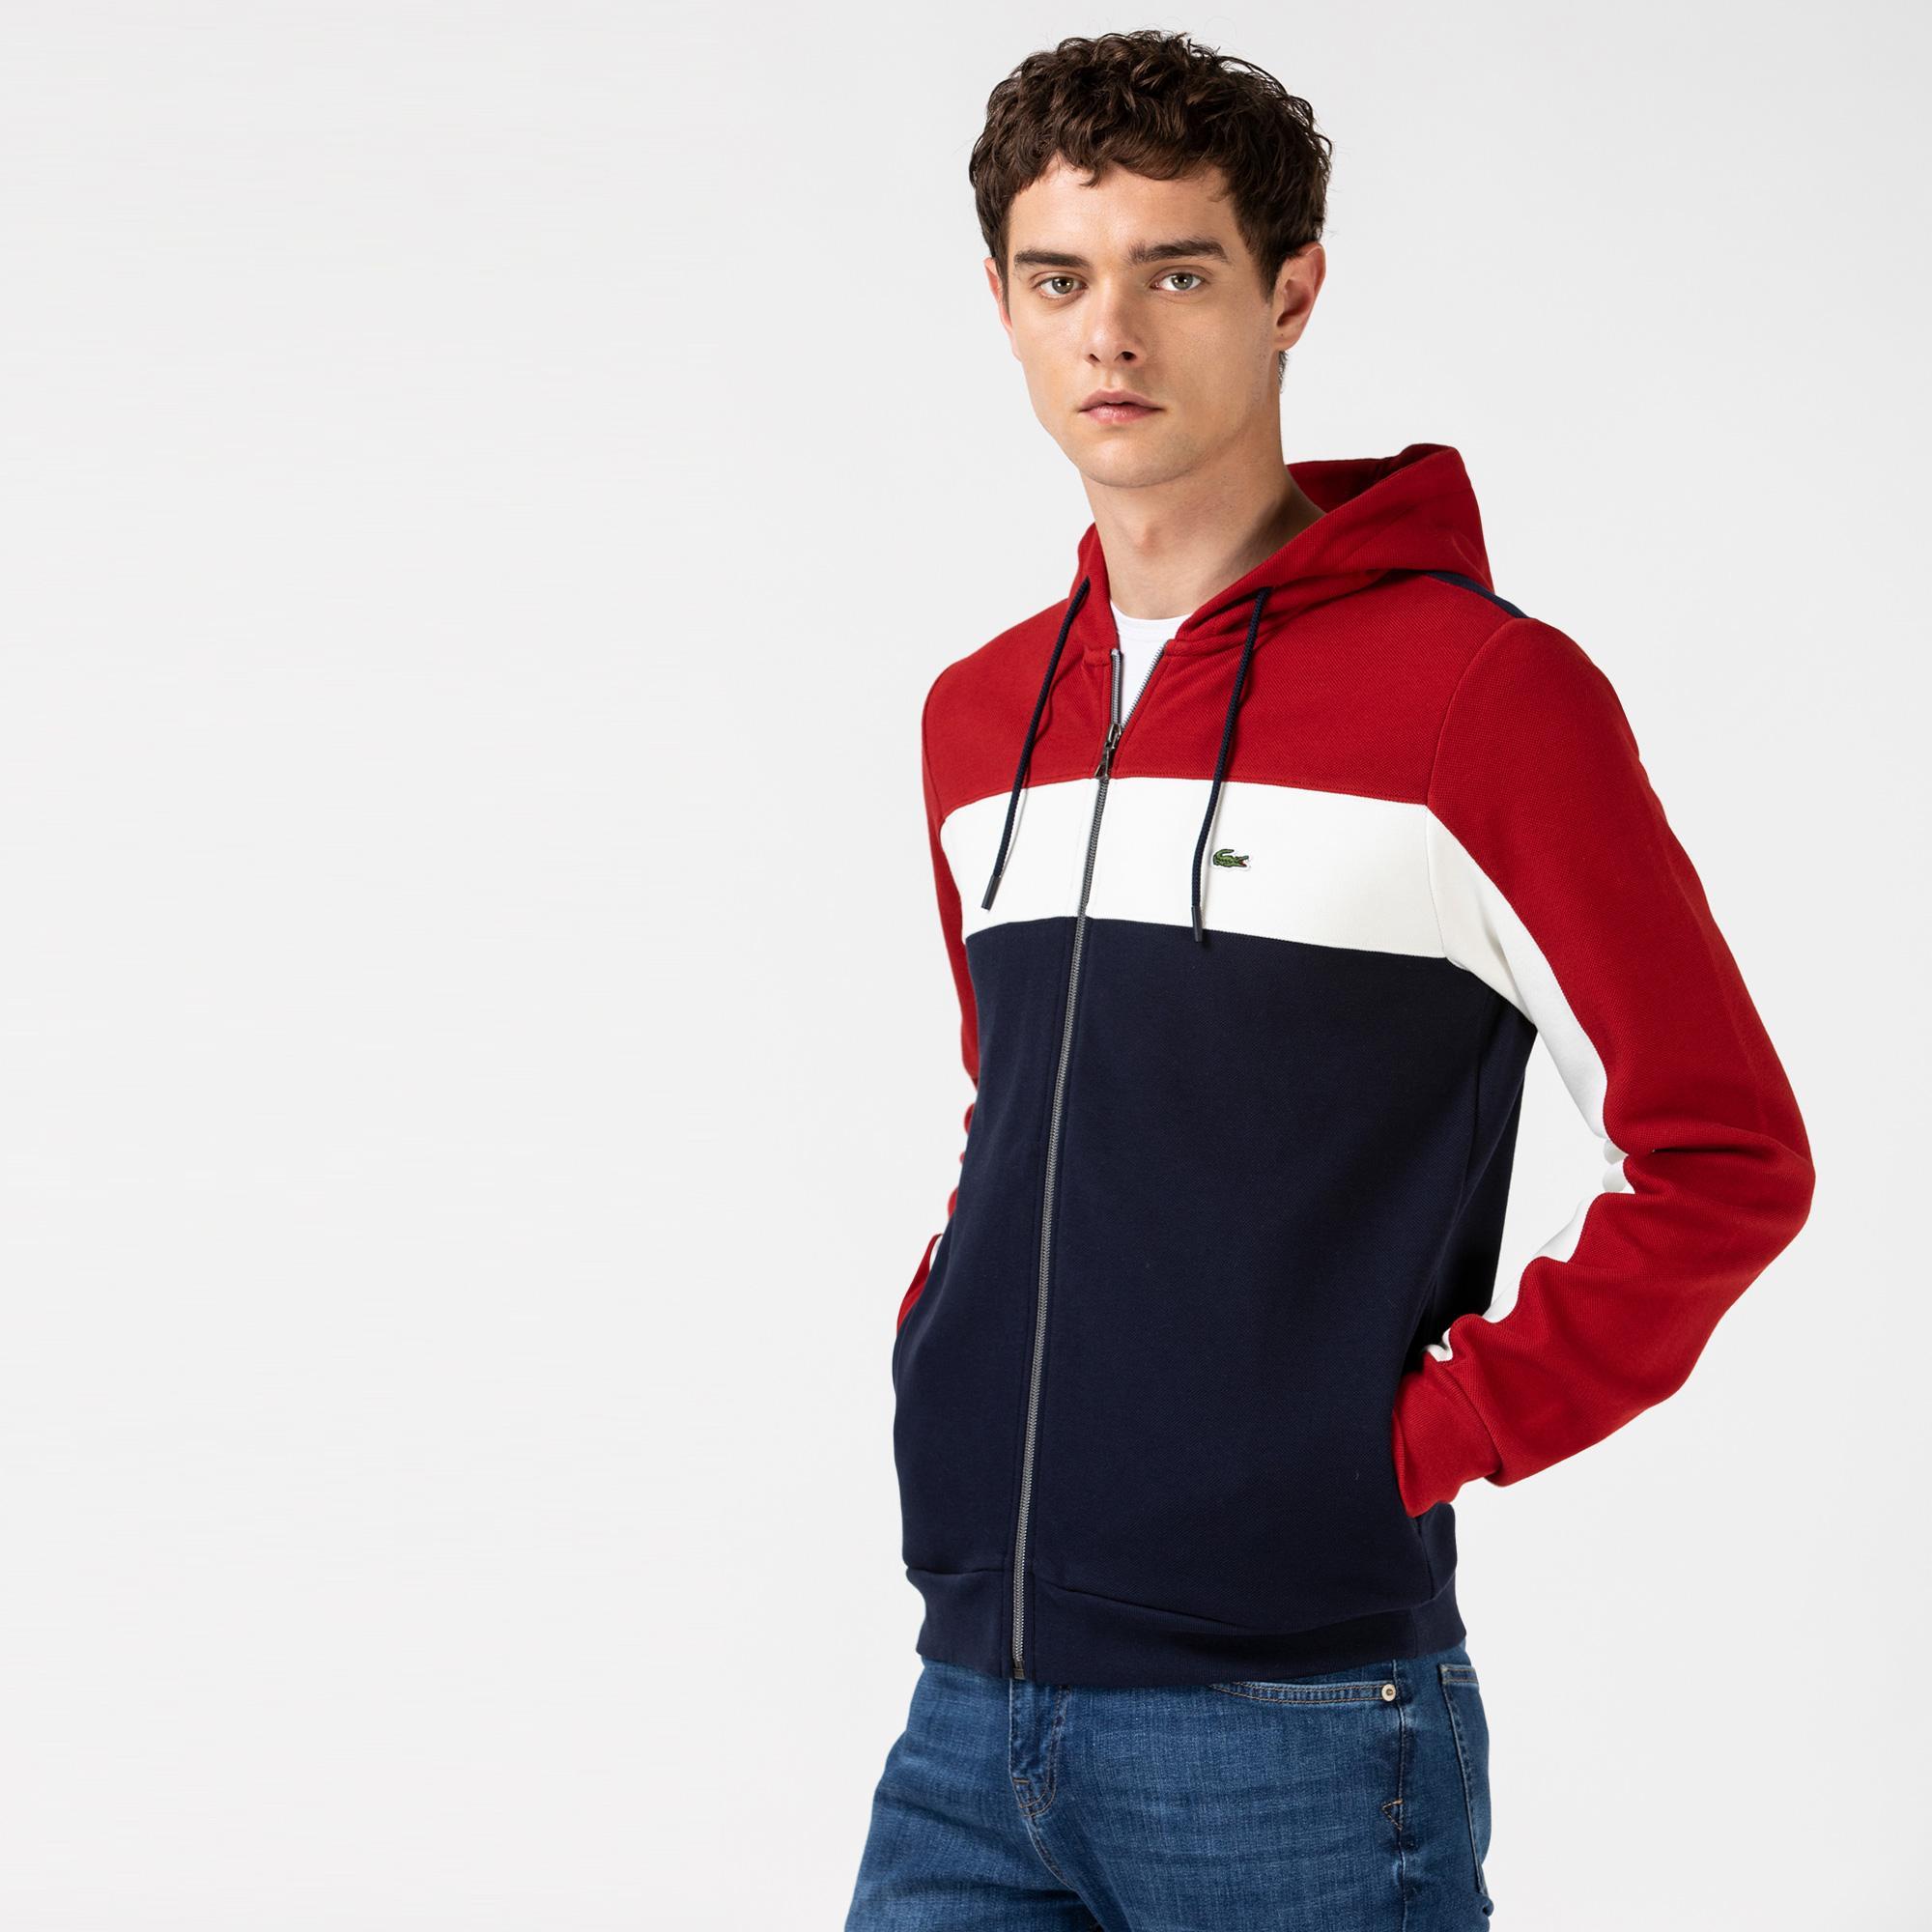 Lacoste Erkek Blok Desenli Kapüşonlu Renkli Sweatshirt